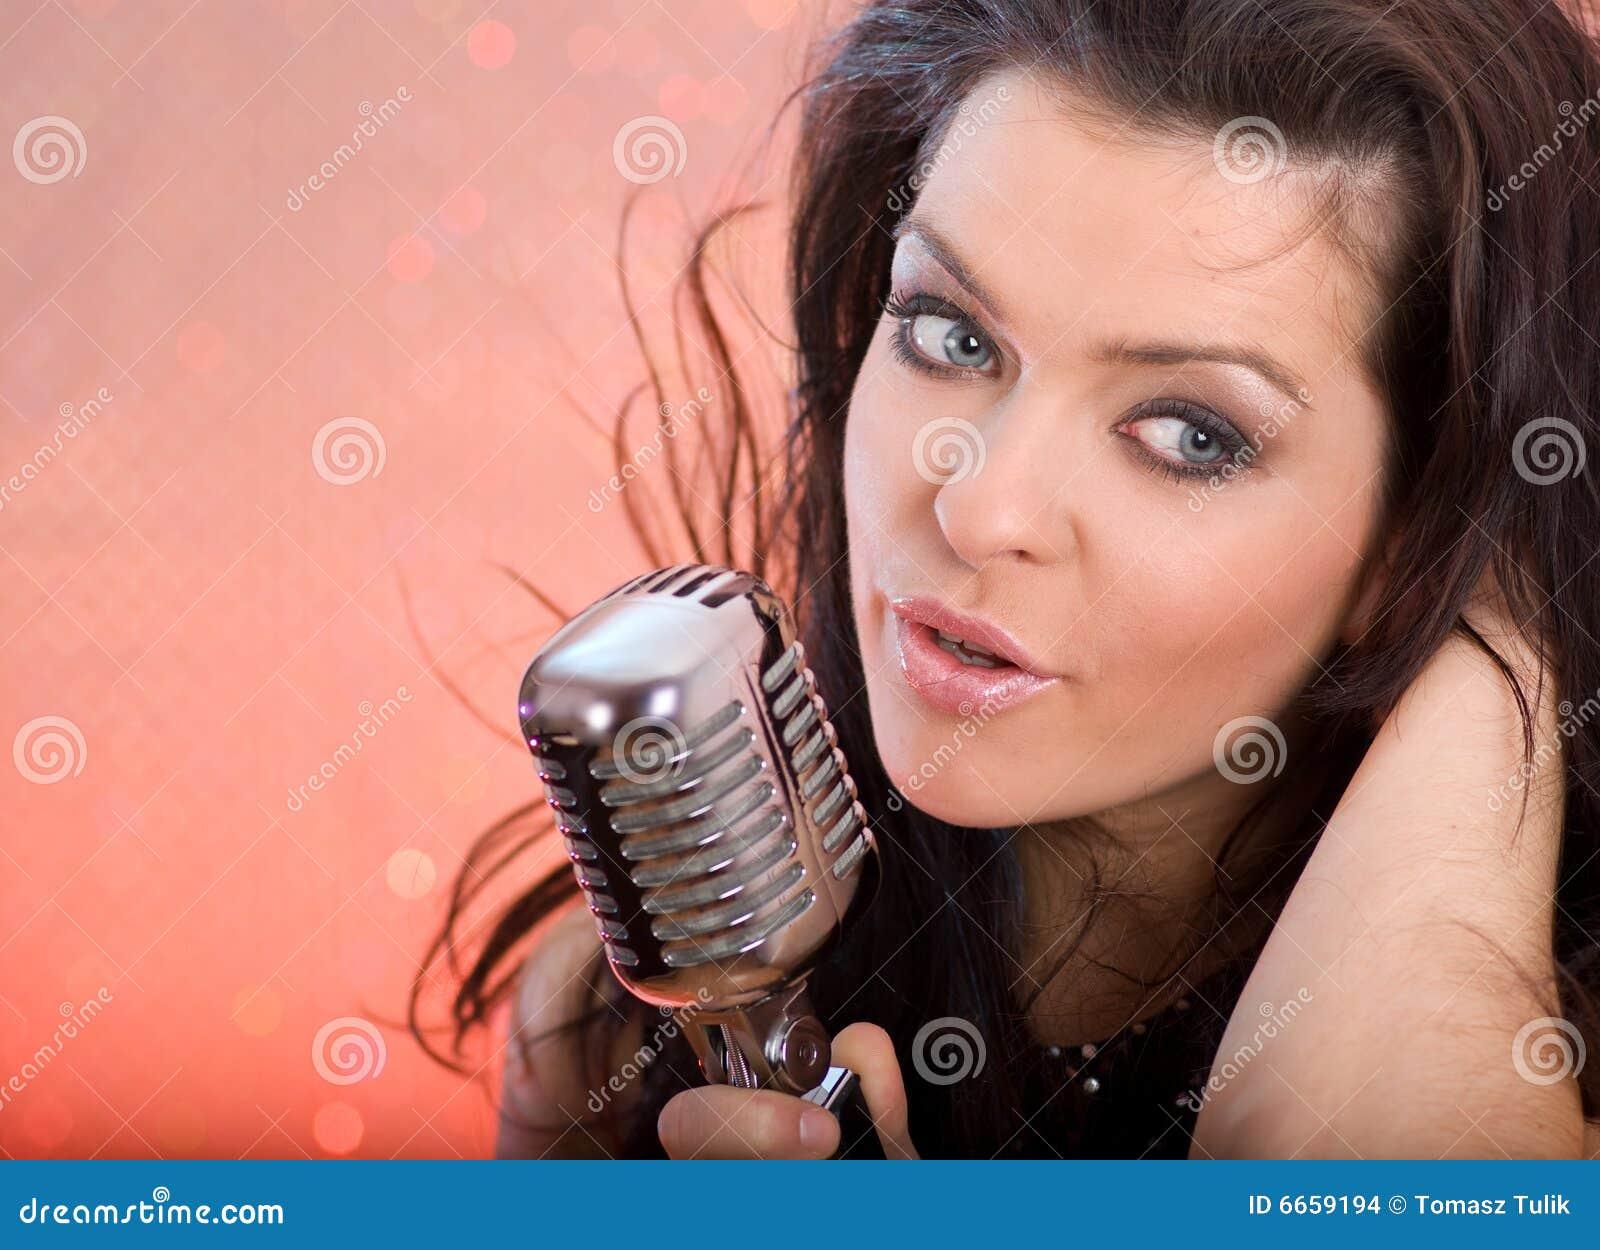 singing the girl retro - photo #10